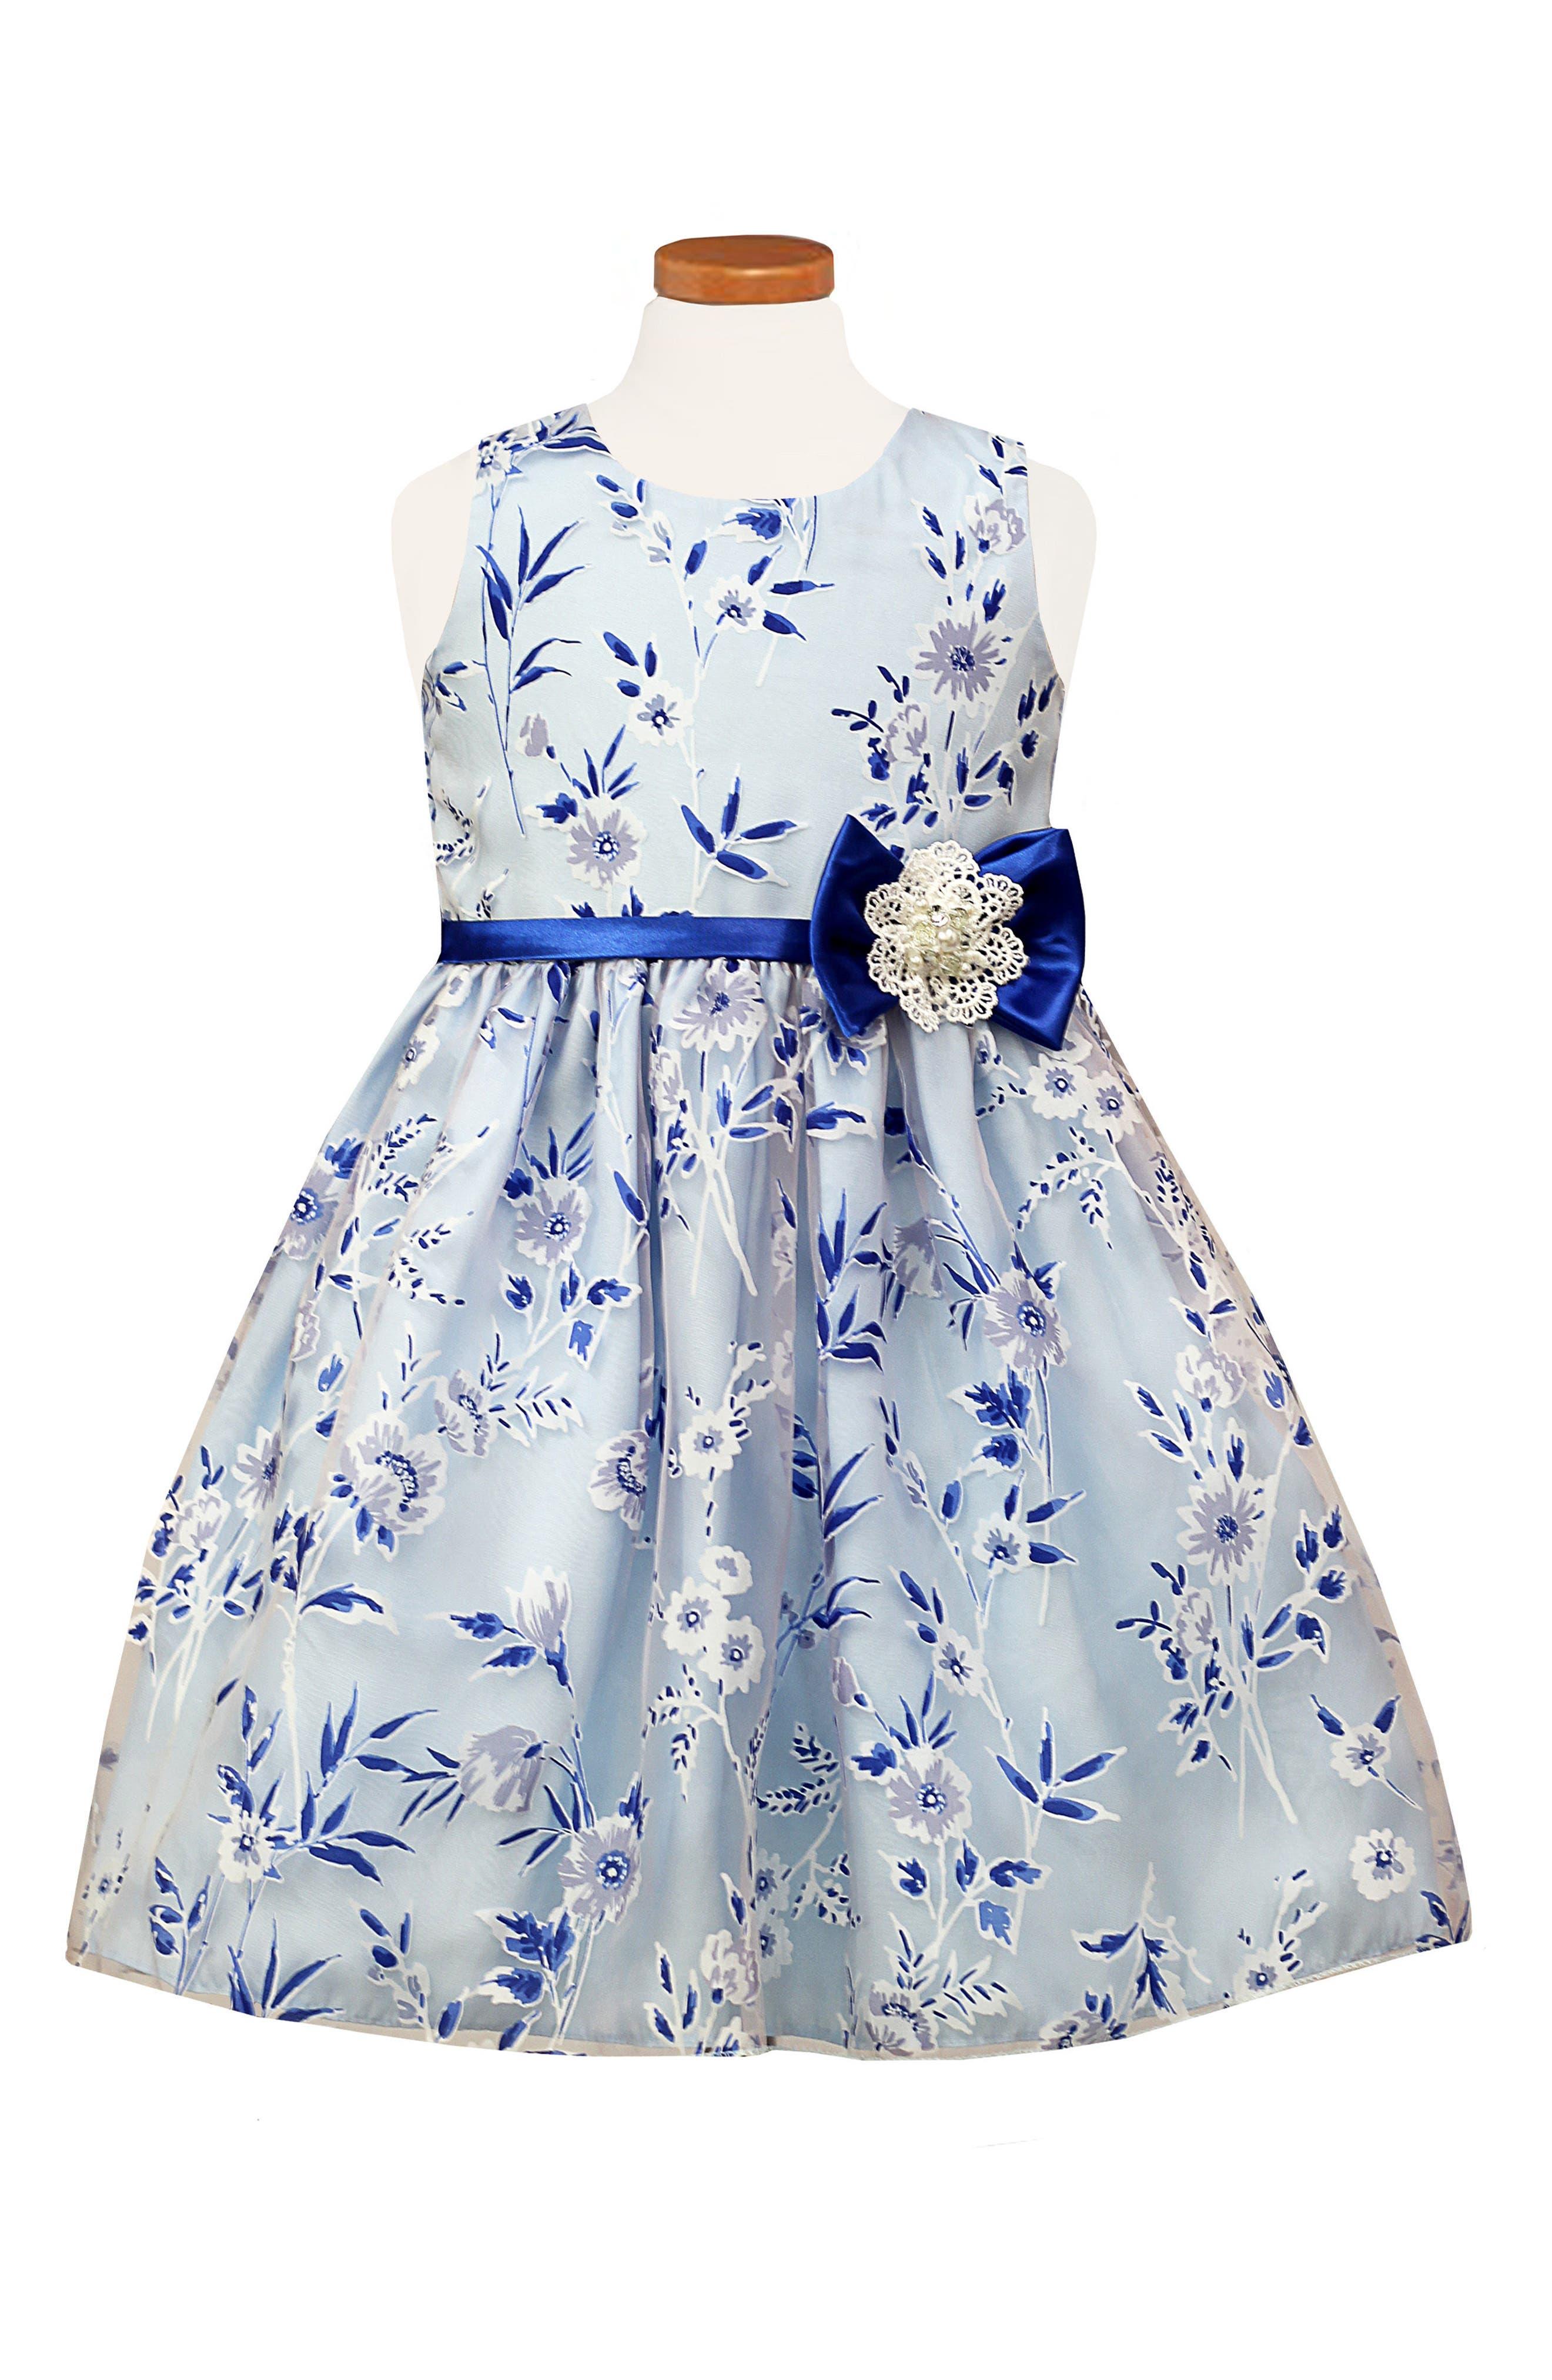 Floral Sleeveless Dress,                             Main thumbnail 1, color,                             Blue